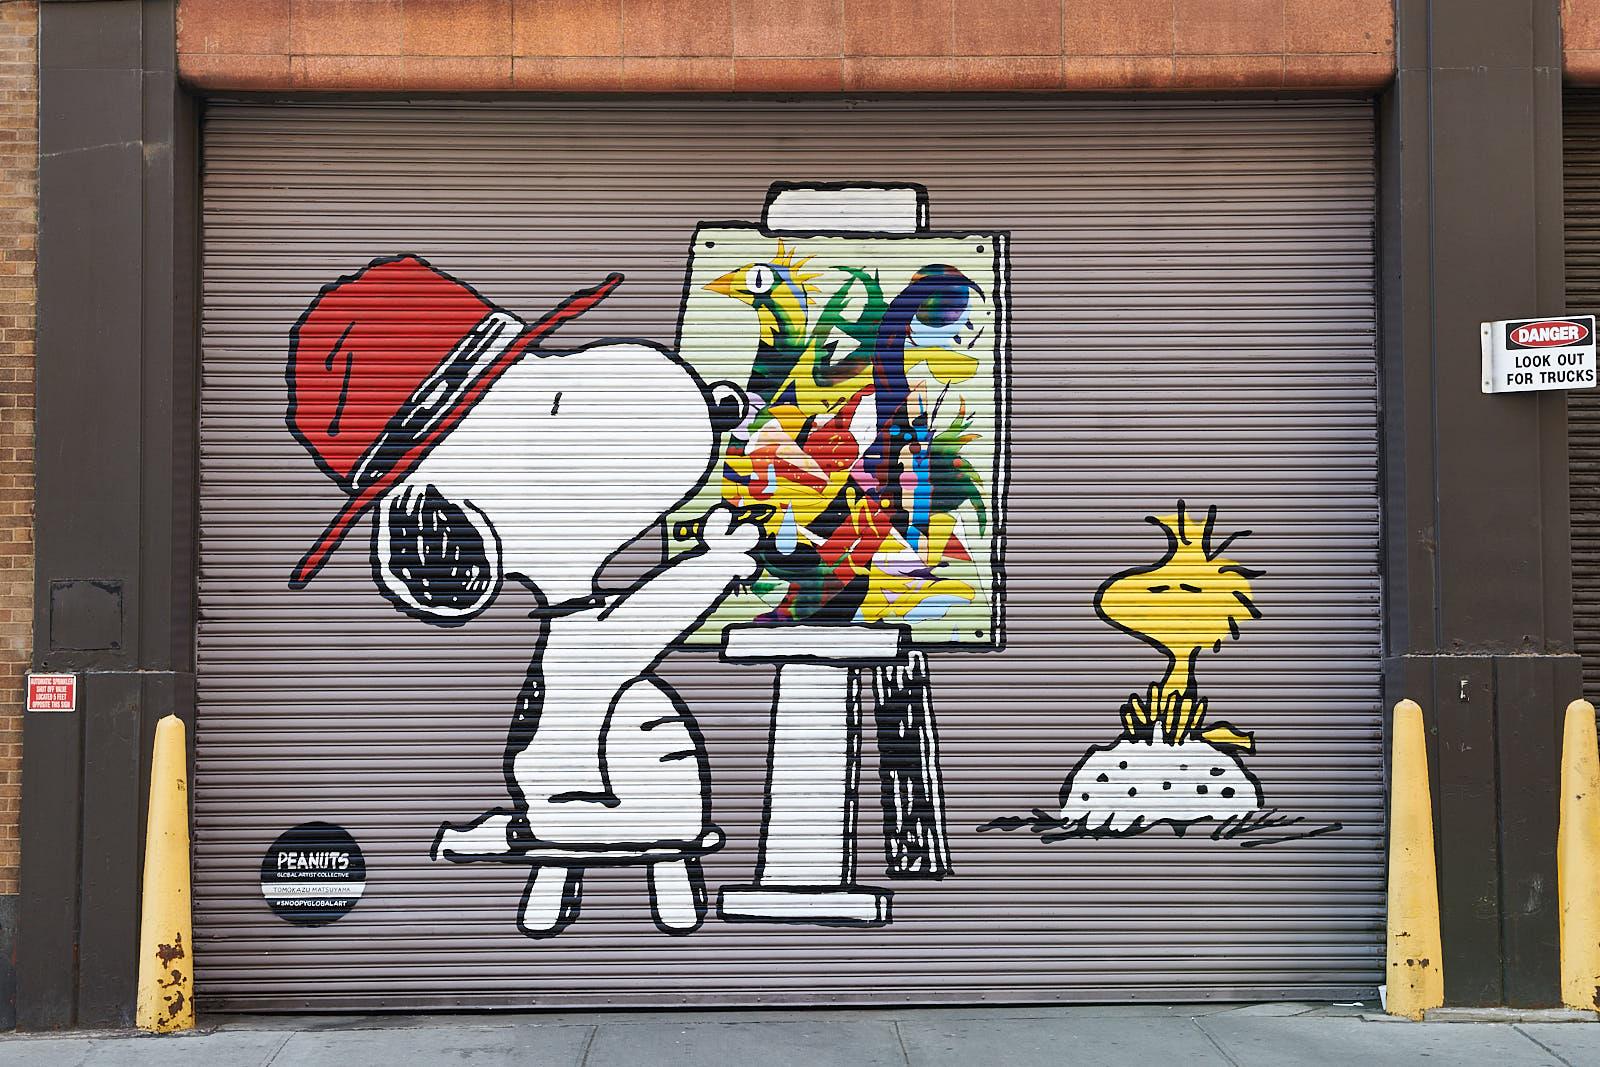 Tomokazu Matsuyama x Peanuts Global Artist Collective in New York City